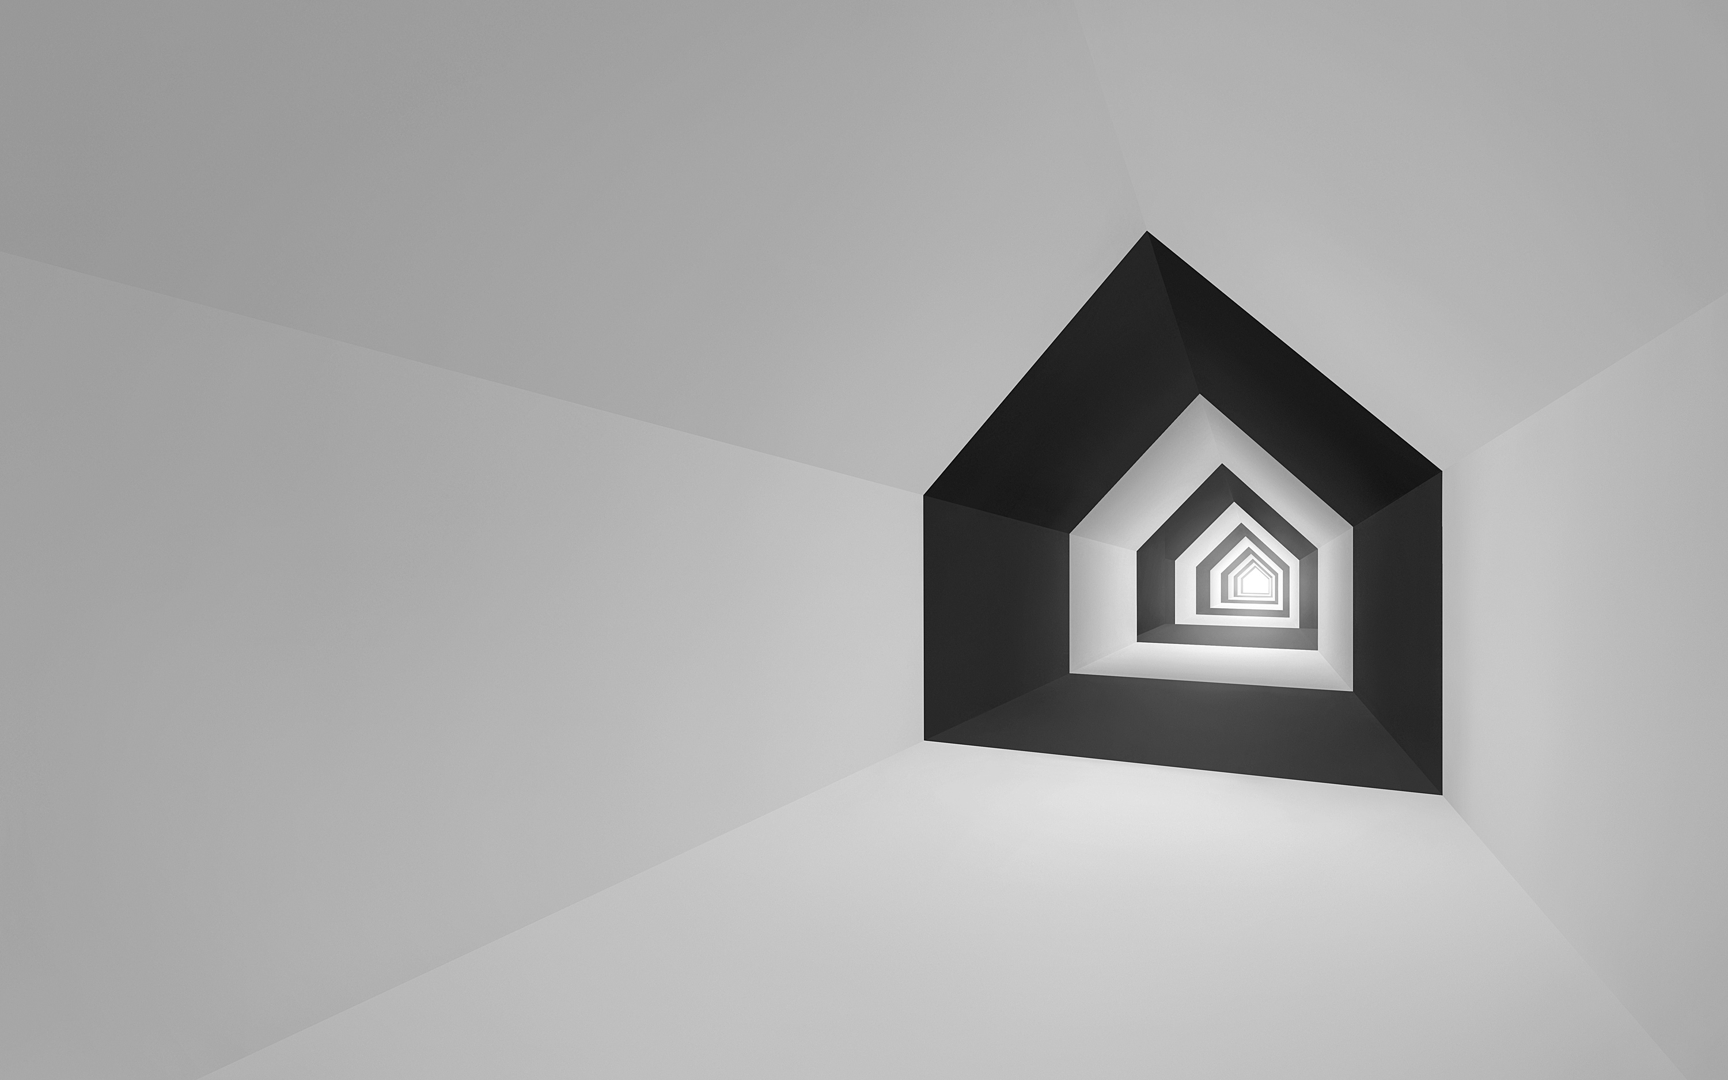 nendo  exhibition  concept  renders image